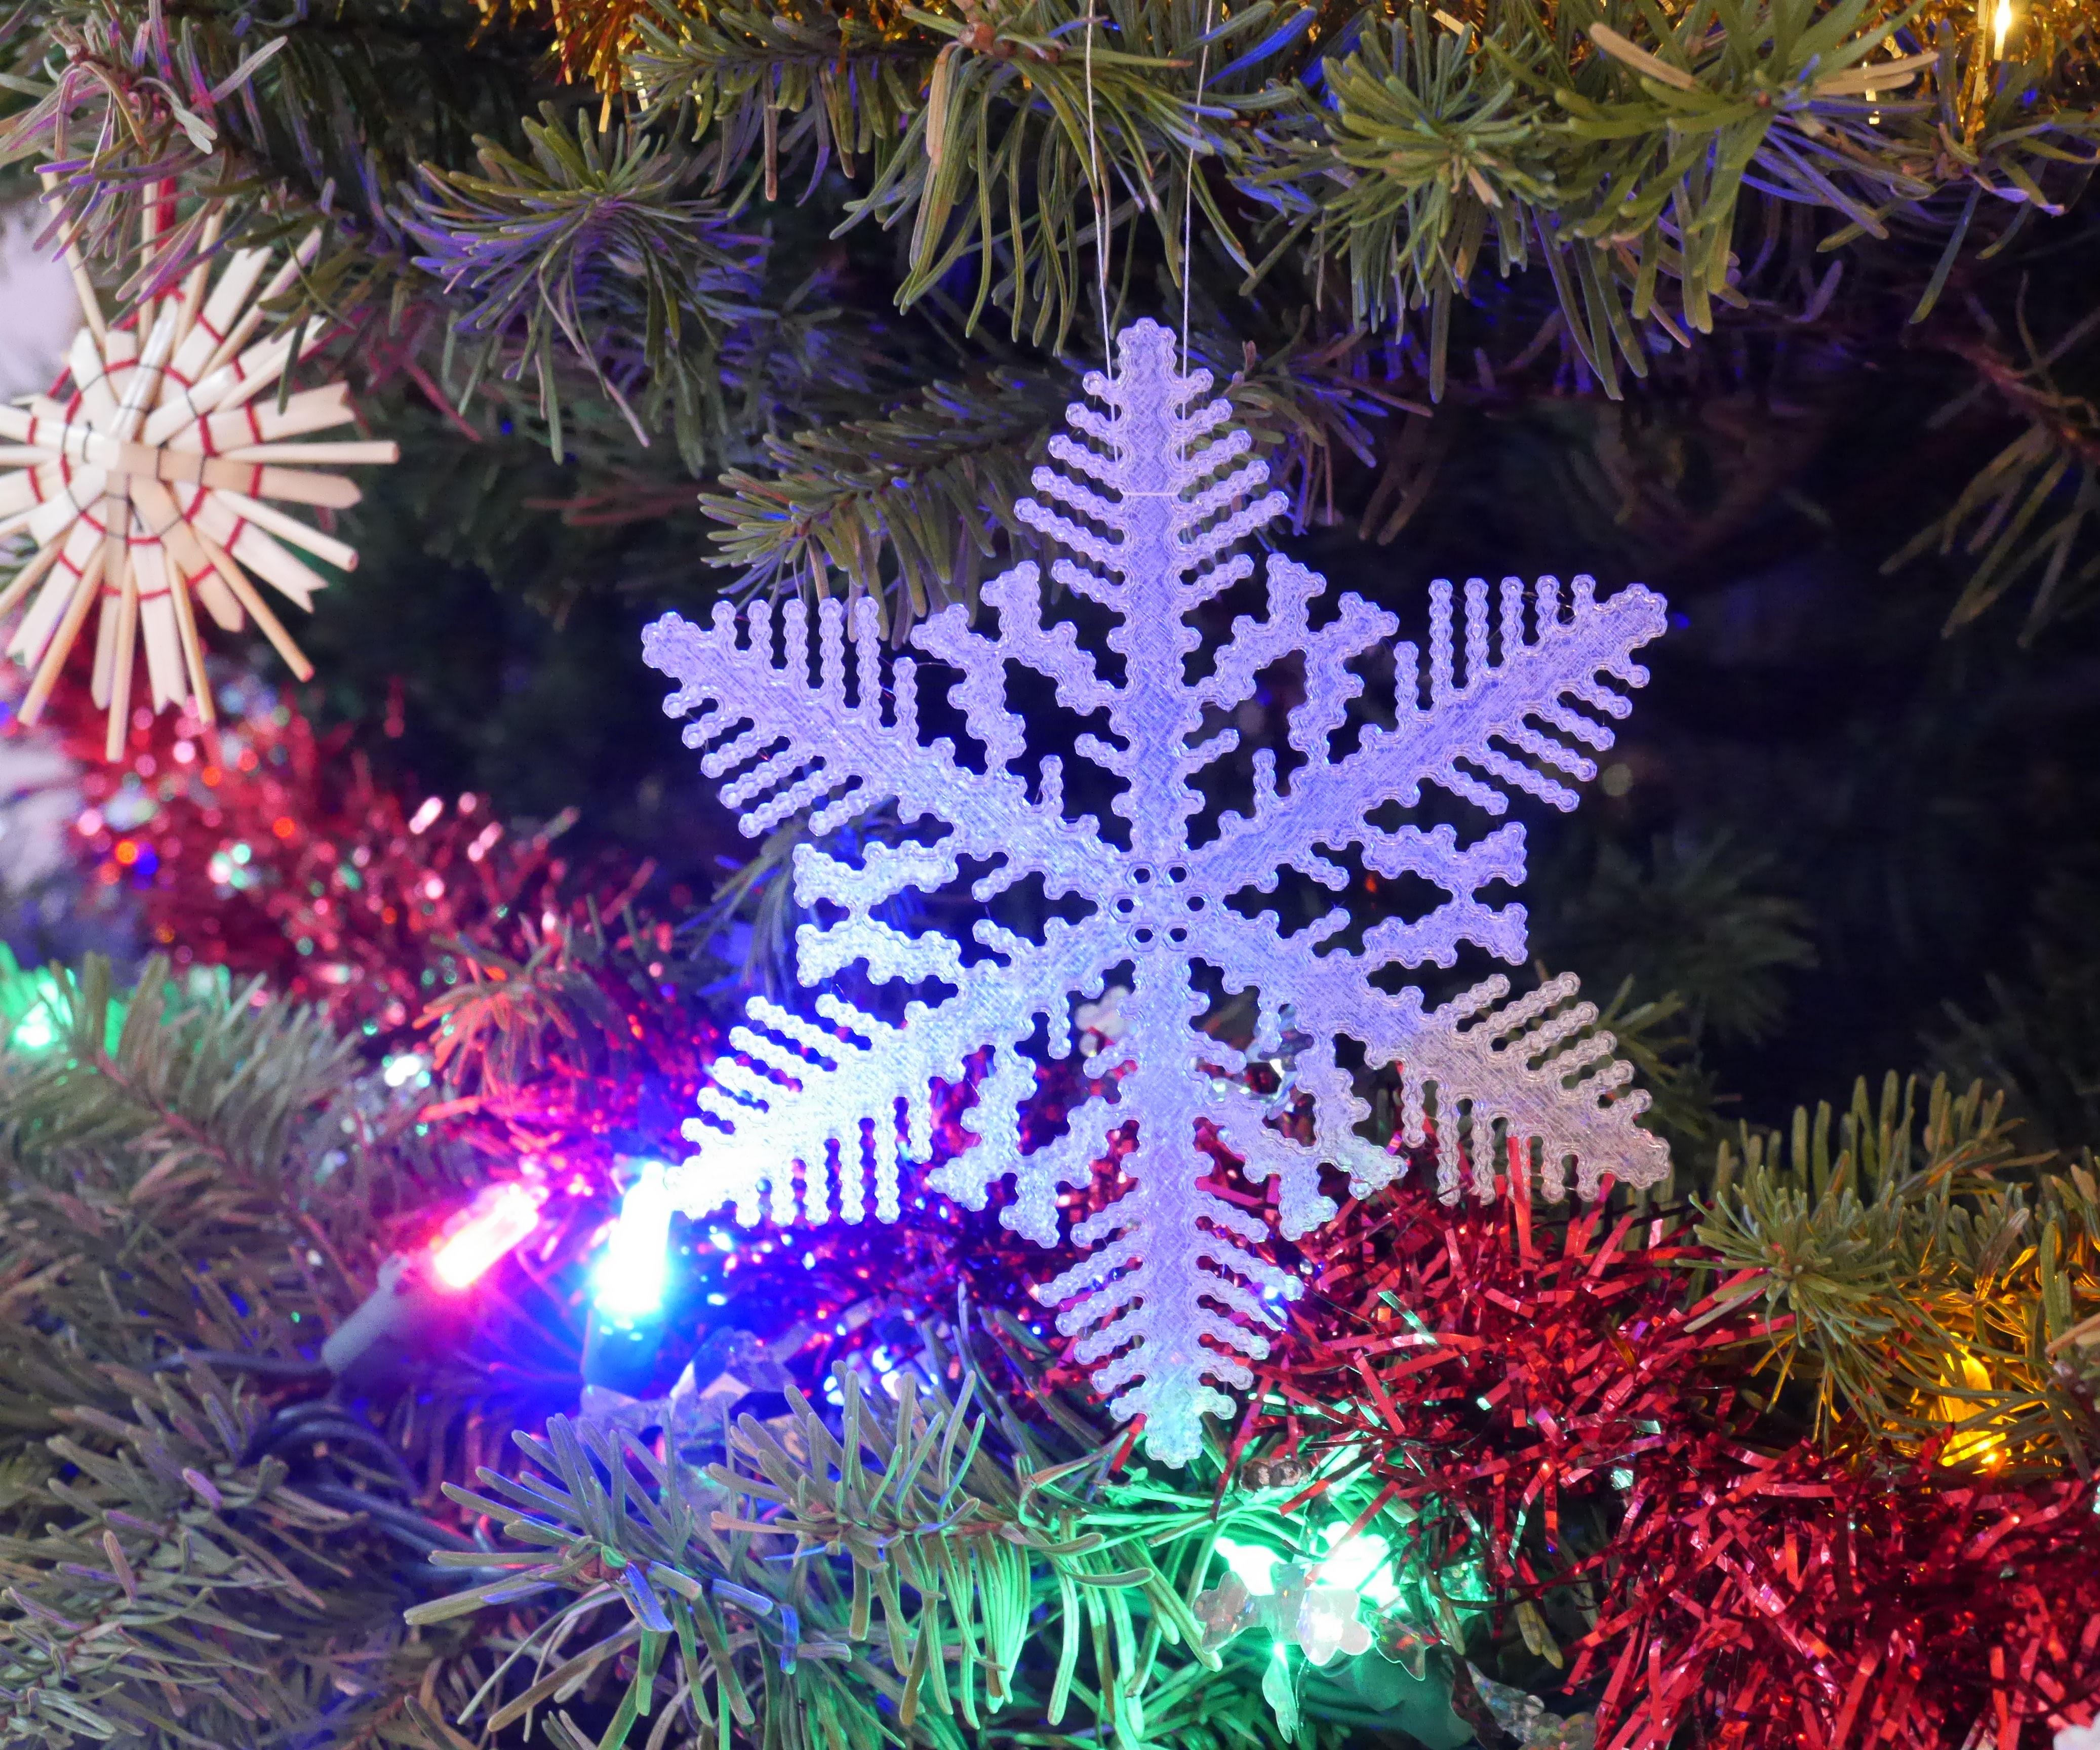 3D Print Simulated Snowflakes